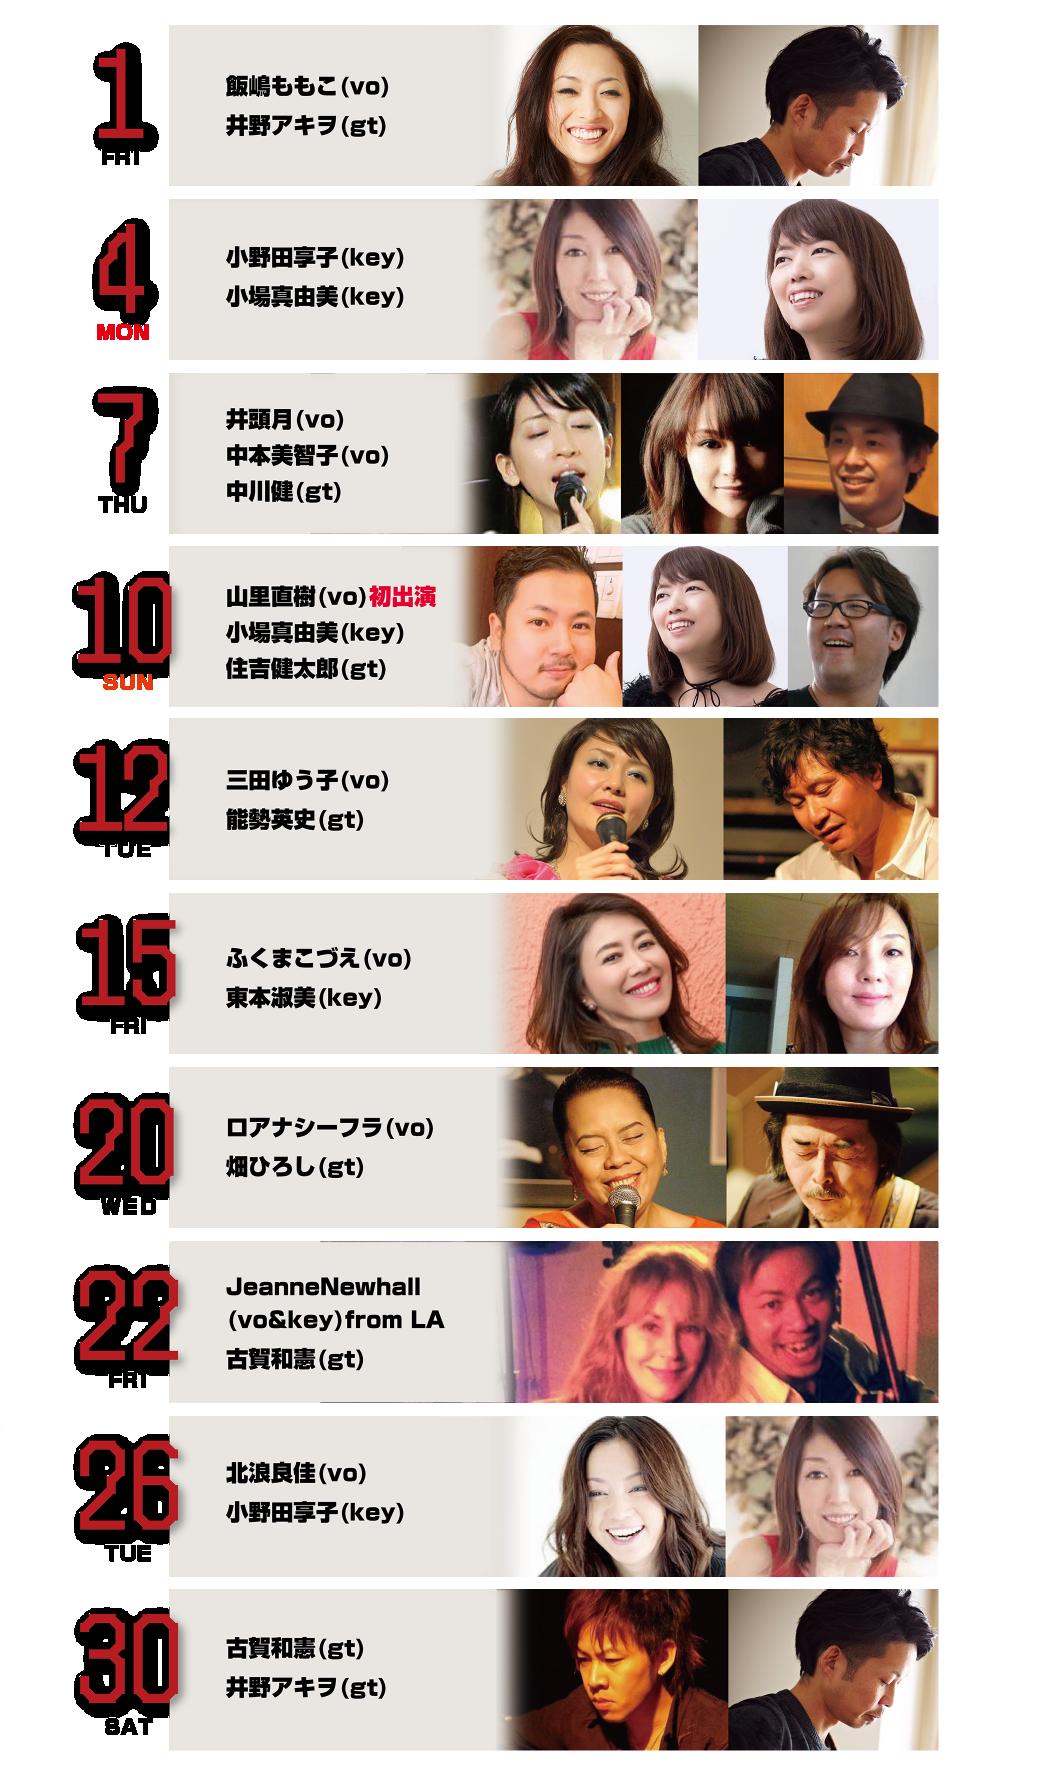 https://kitano-pickup.com/php/images/019.11.png